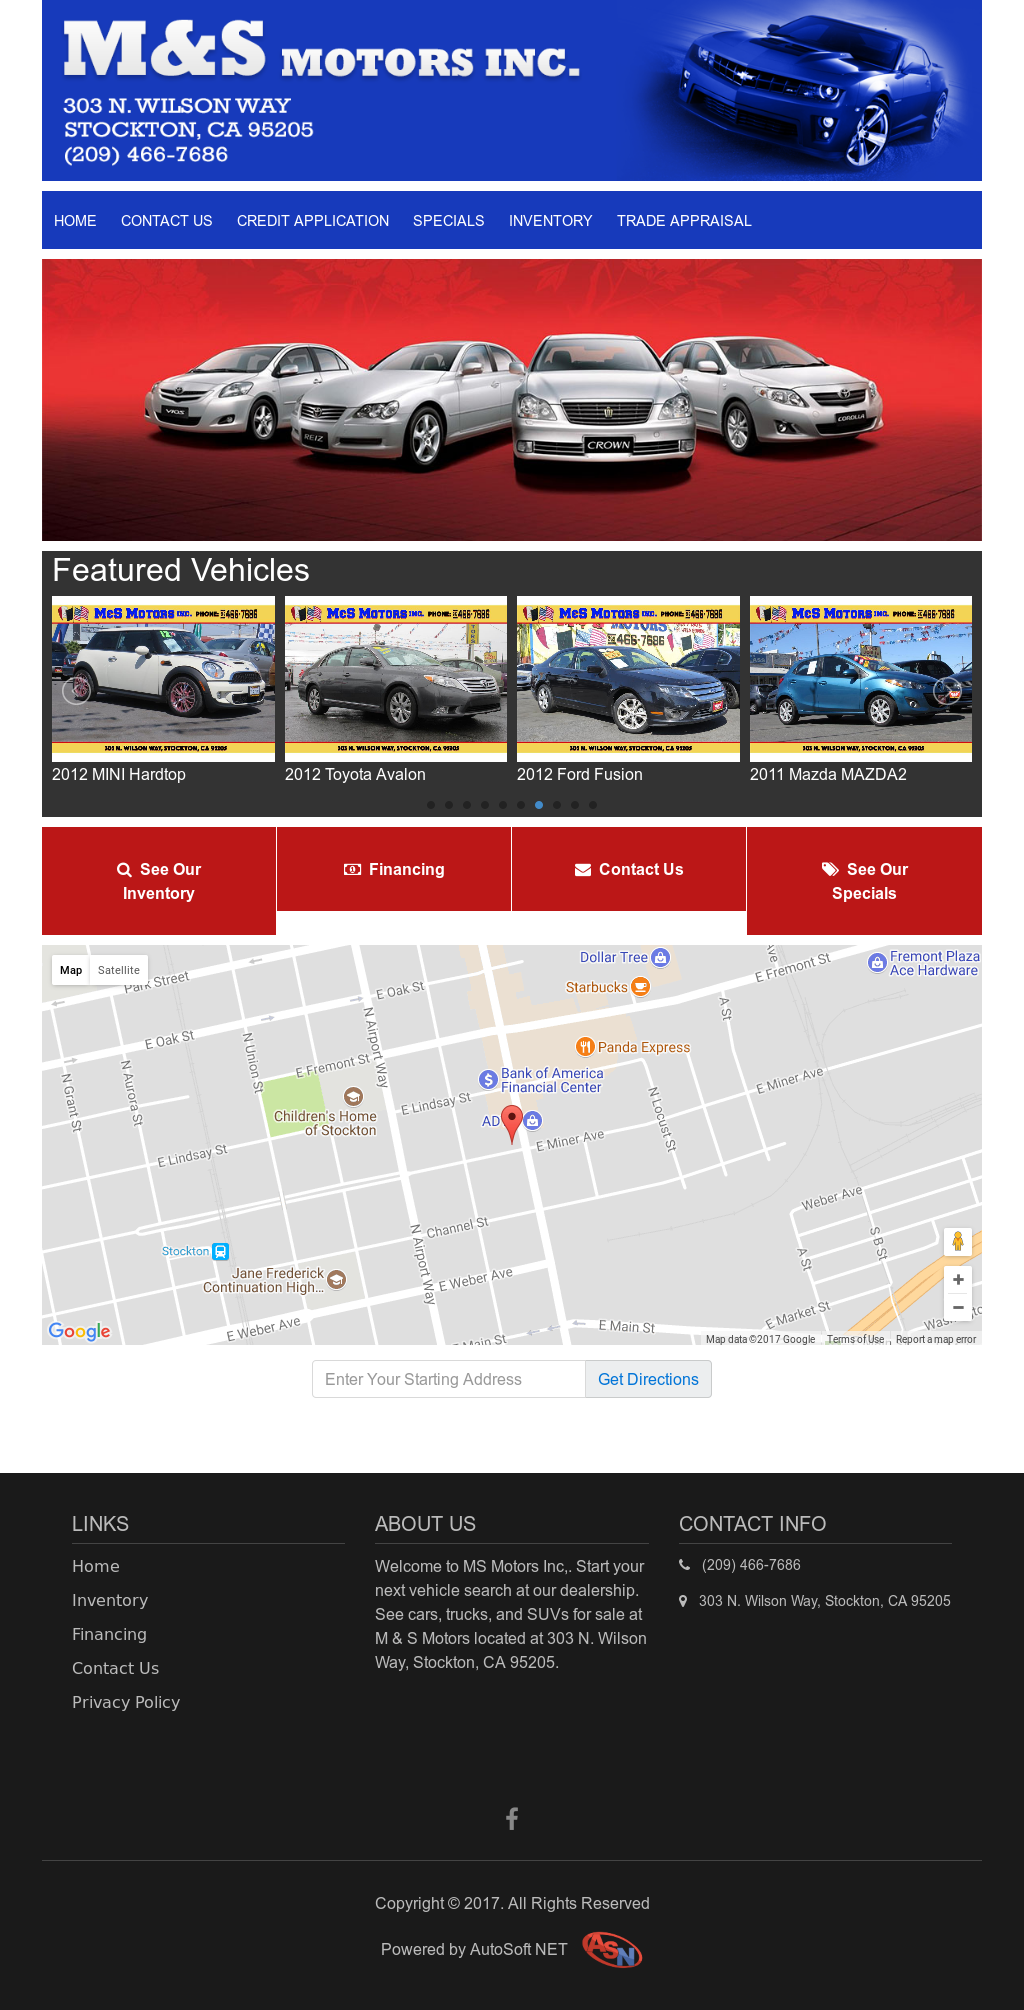 M&s Motors website history